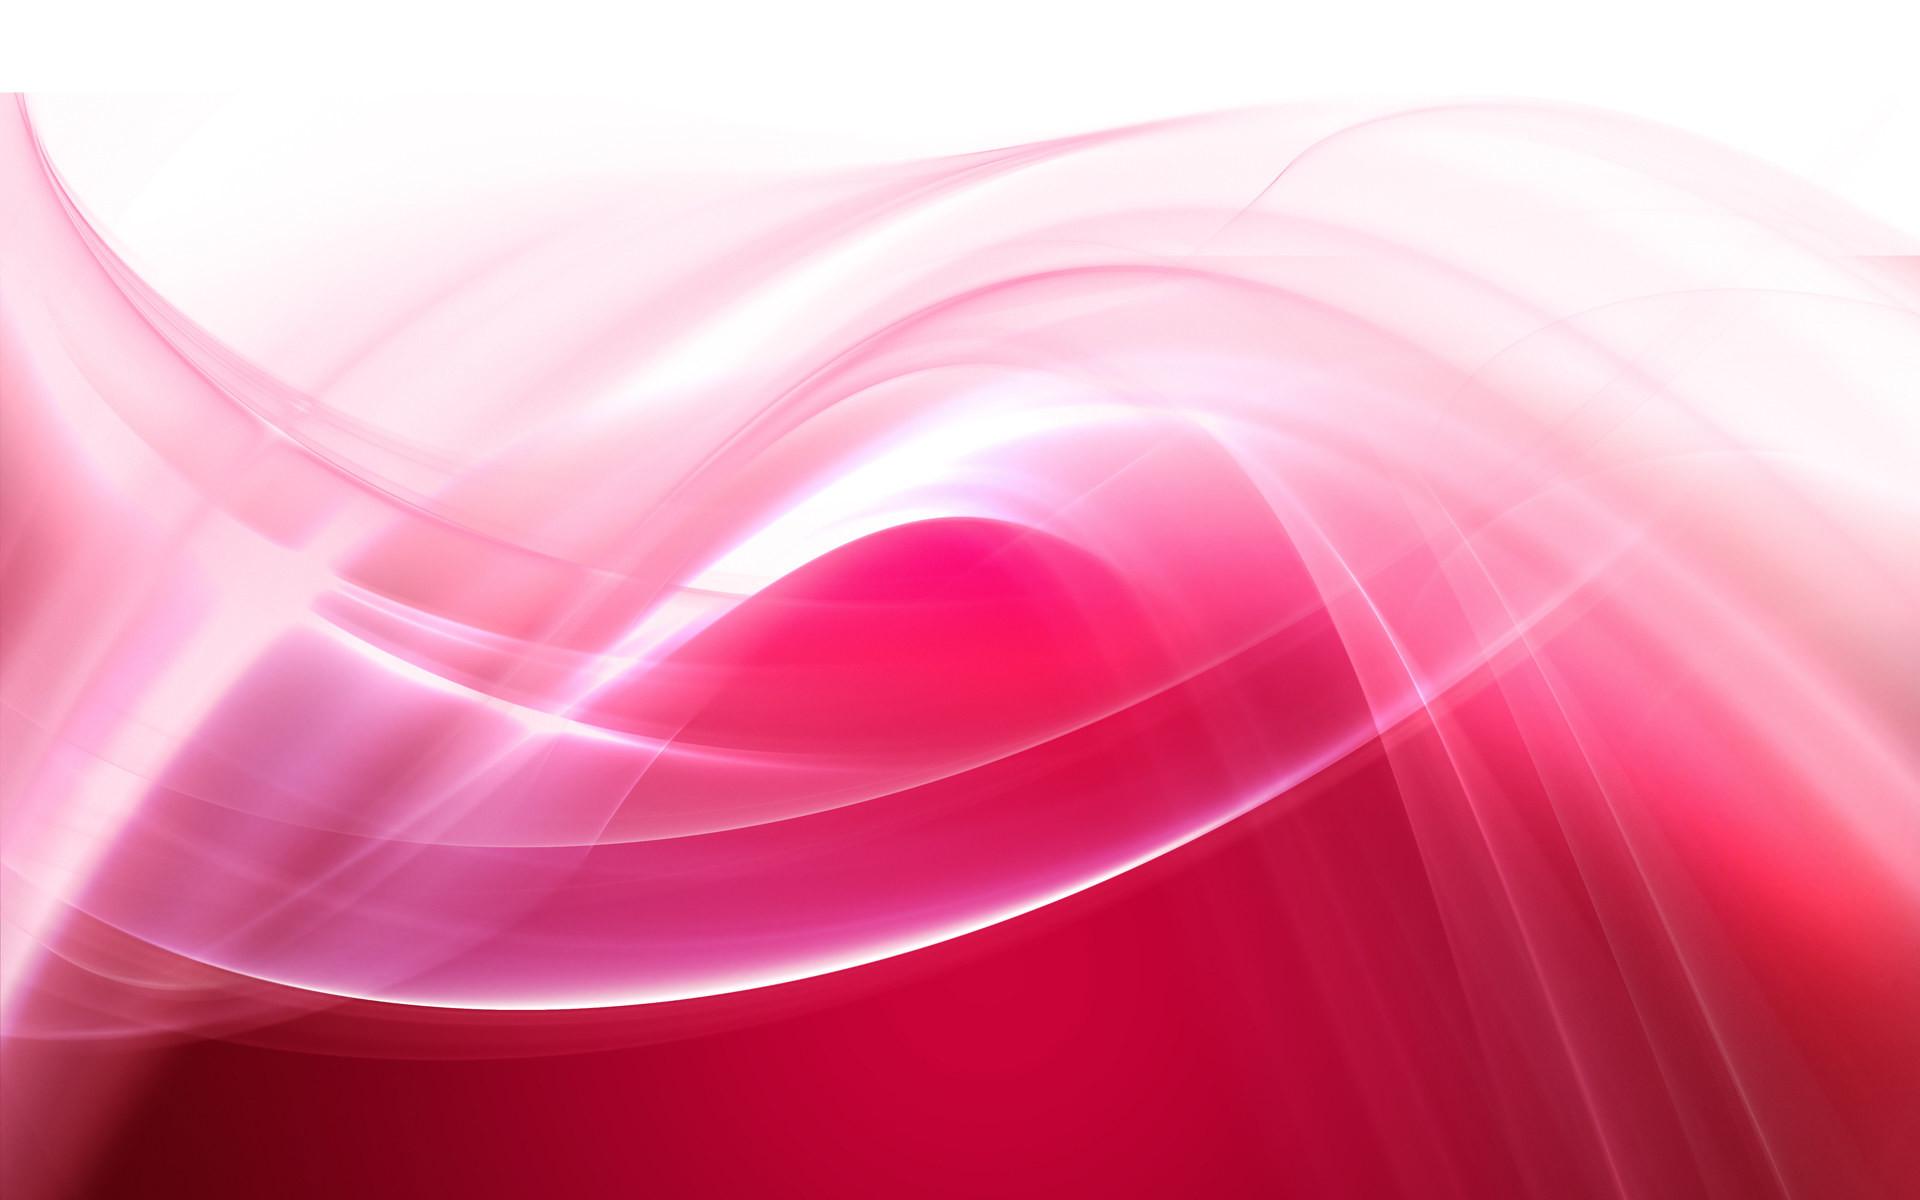 Pink Abstract Desktop Backgrounds HD 1560 – HD Wallpaper Site